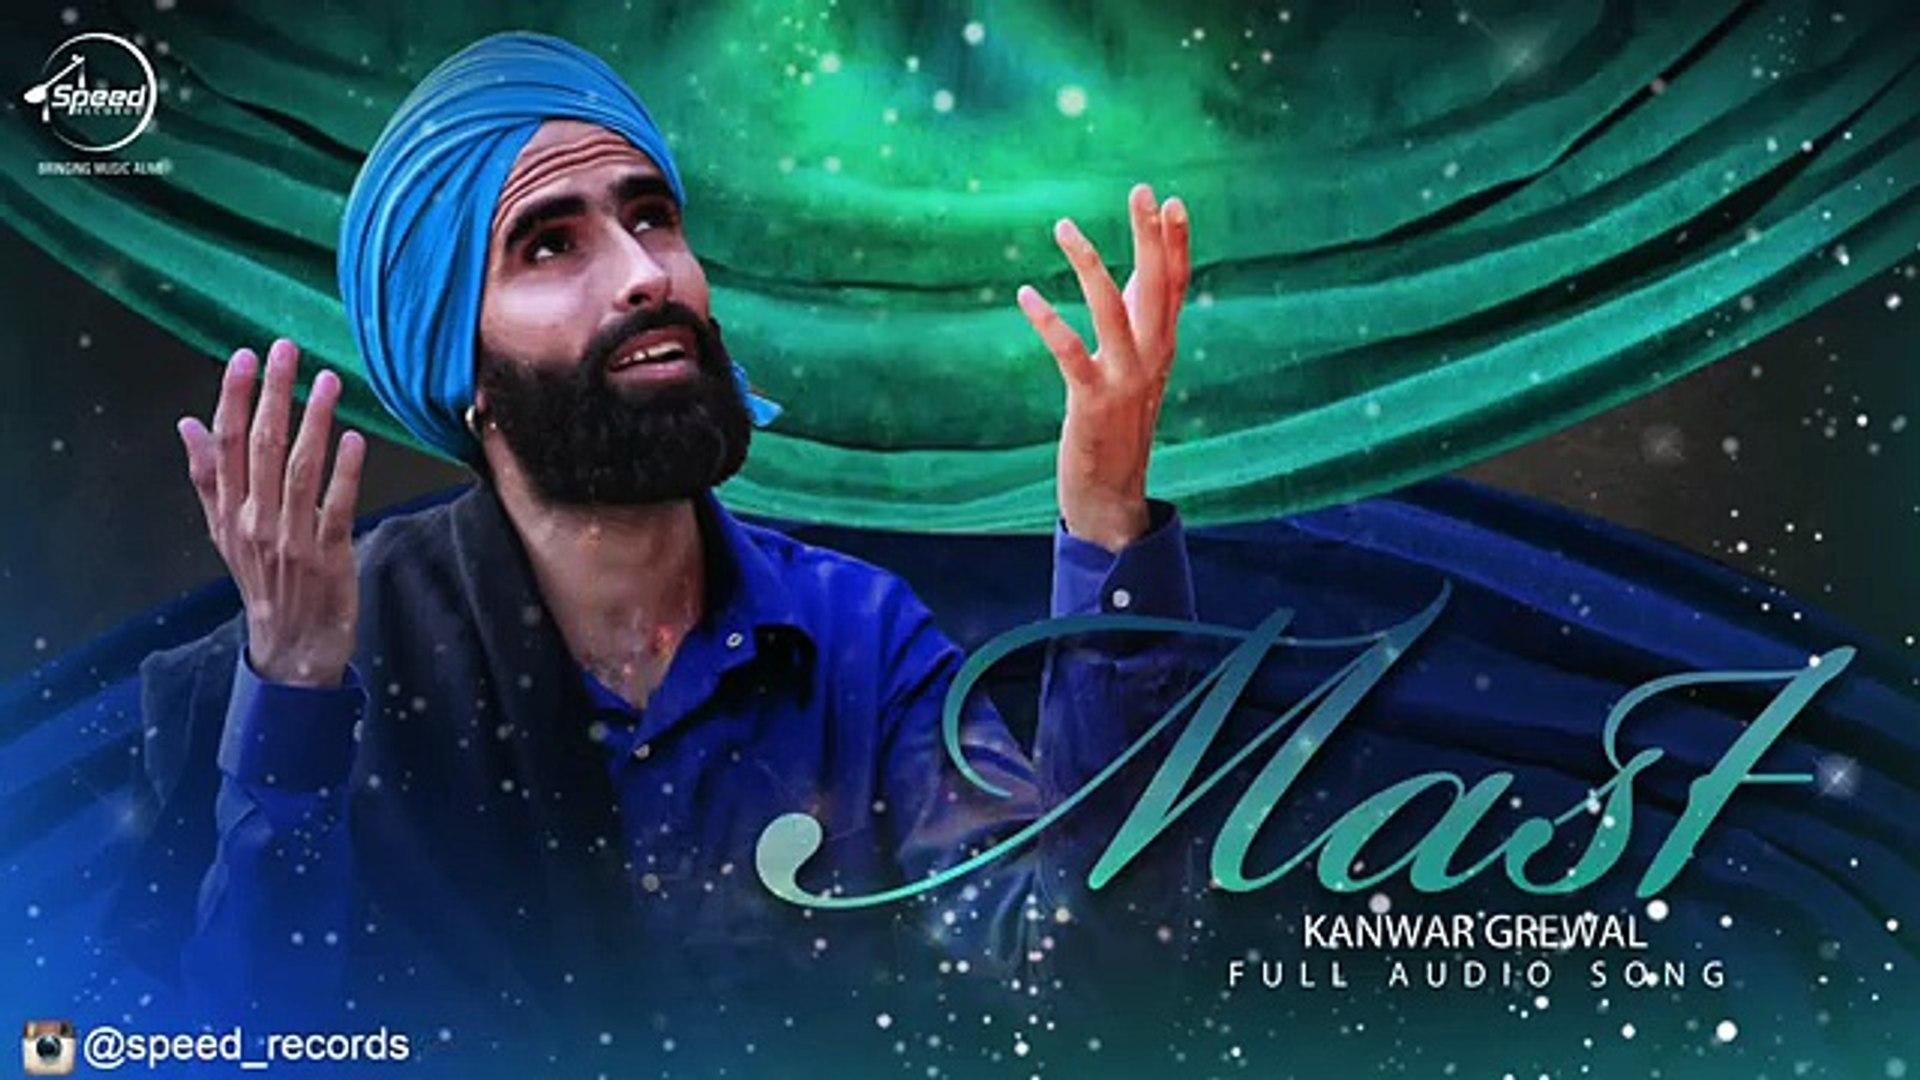 Mast ( Full Audio Song ) - Kanwar Grewal - Punjabi Song 2016 - Songs HD